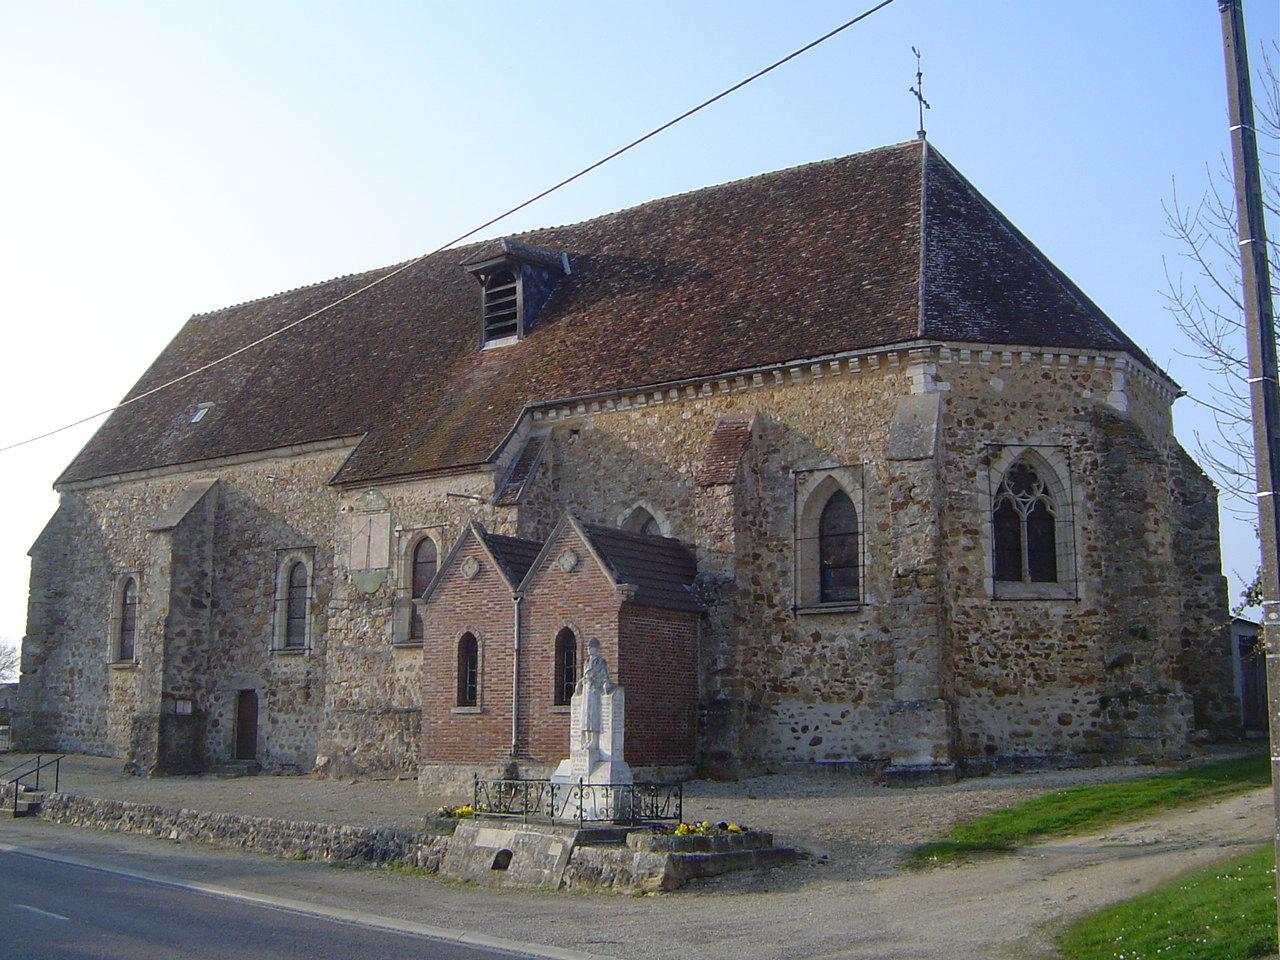 Bercenay-le-Hayer